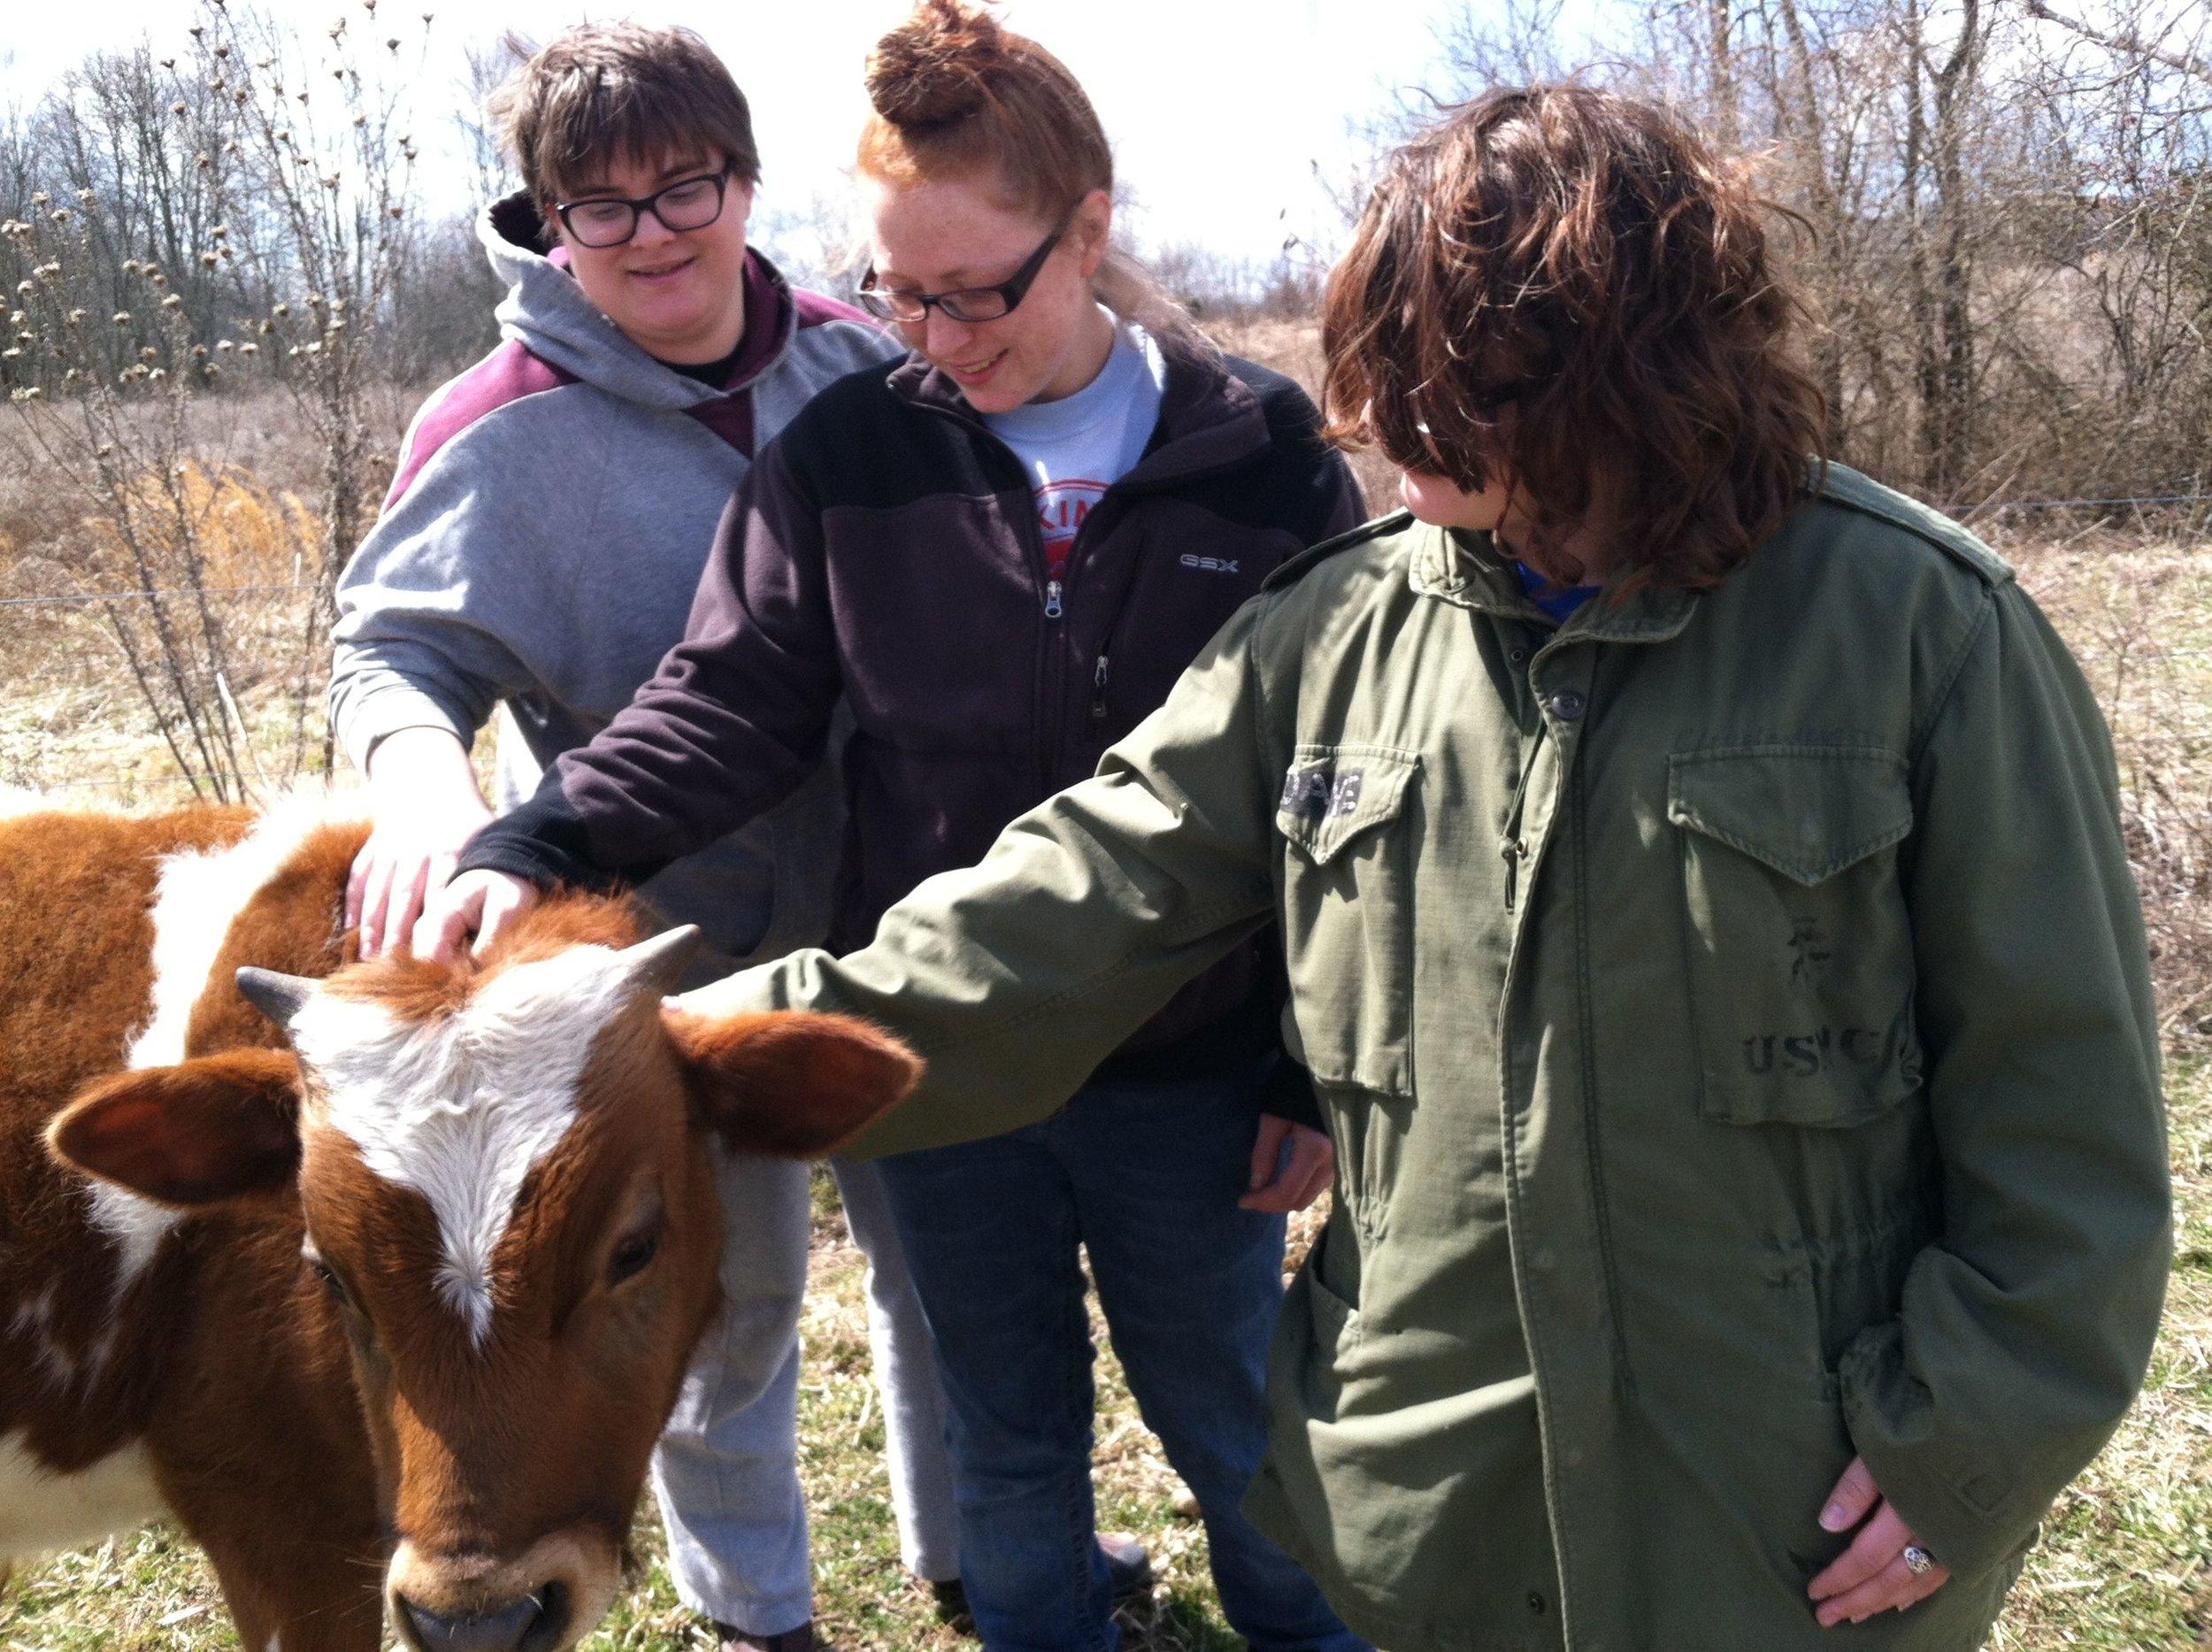 spring break to Good Earth Farm